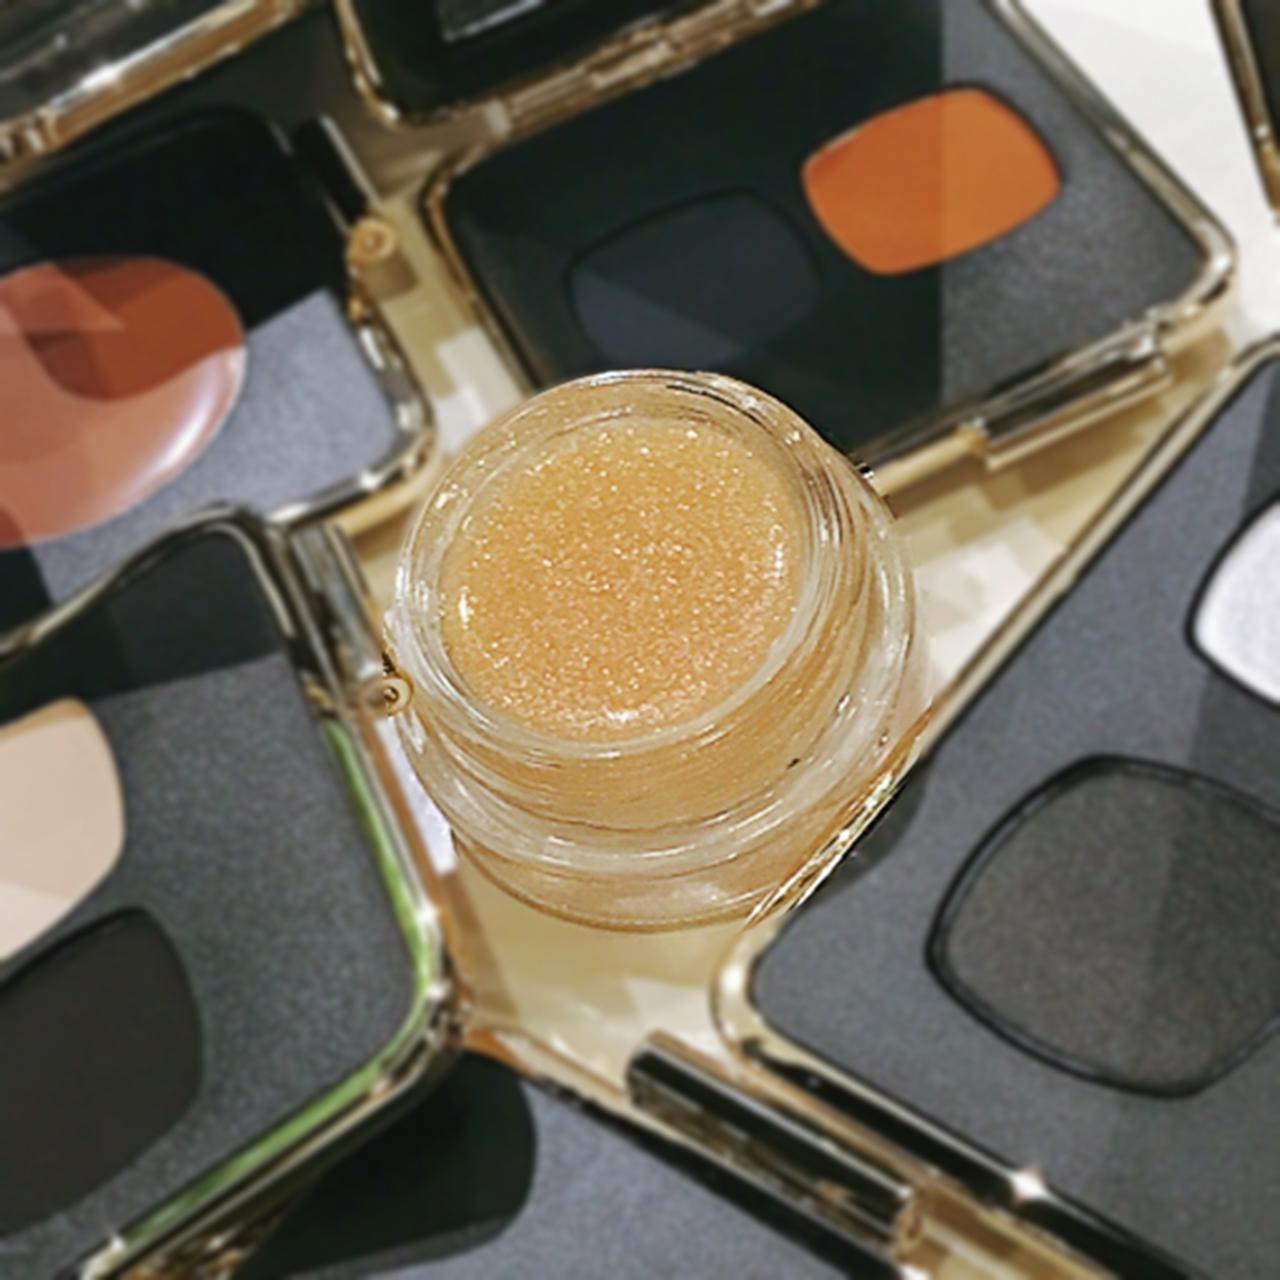 Victoria Beckham x Estee Lauder Aura Gloss in Honey